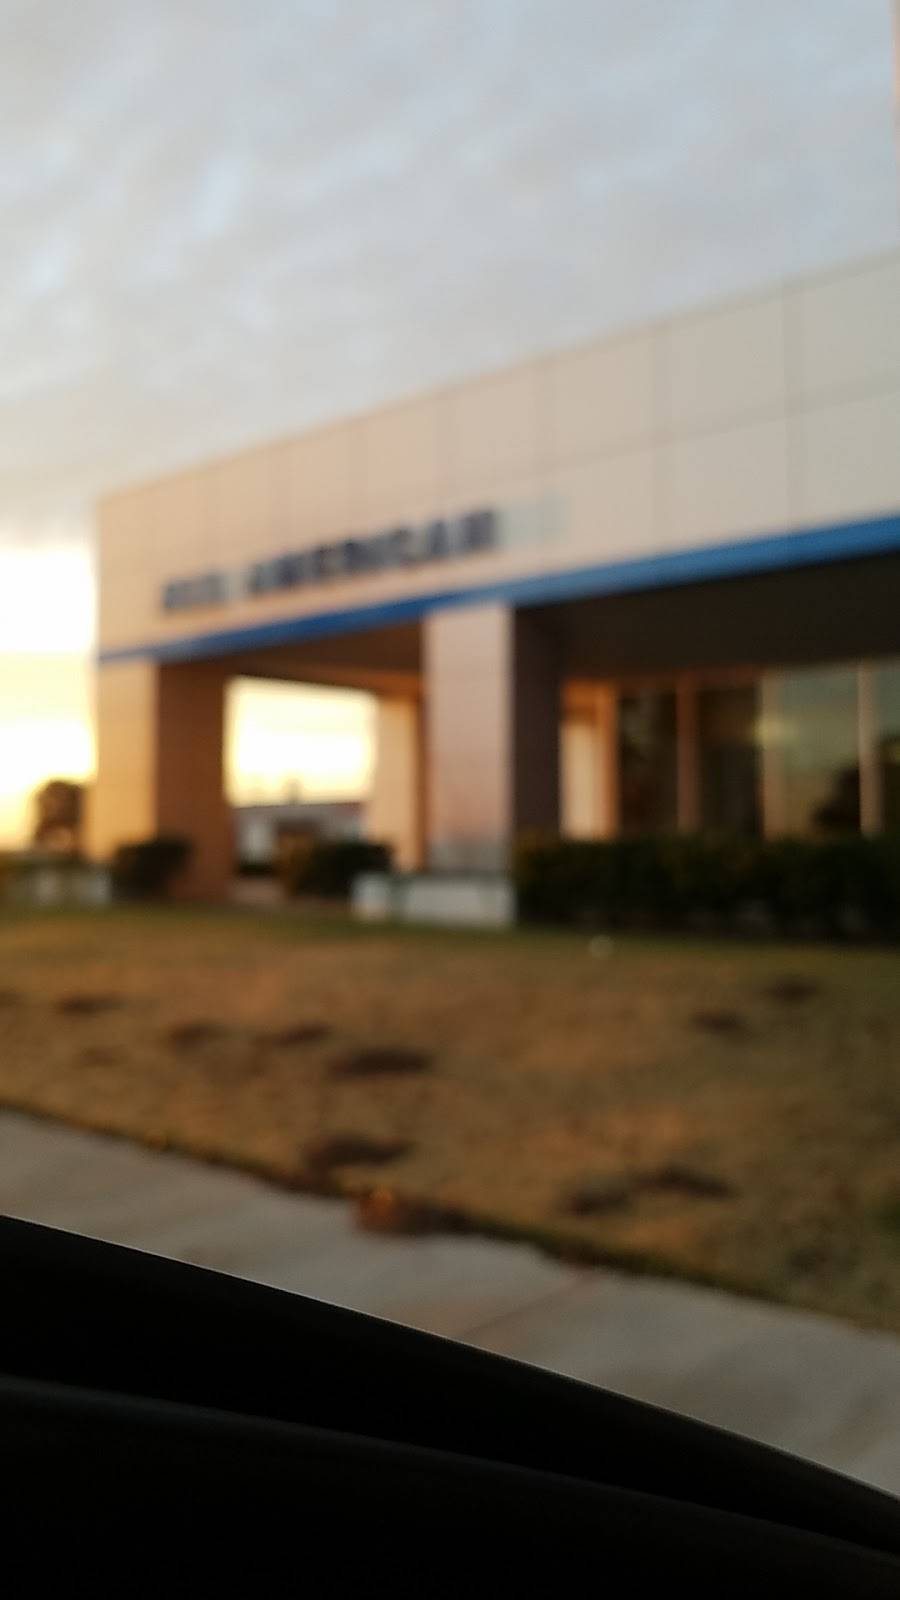 All American Chevrolet - car dealer  | Photo 7 of 7 | Address: 8802 US-84, Slaton, TX 79364, USA | Phone: (806) 828-6261